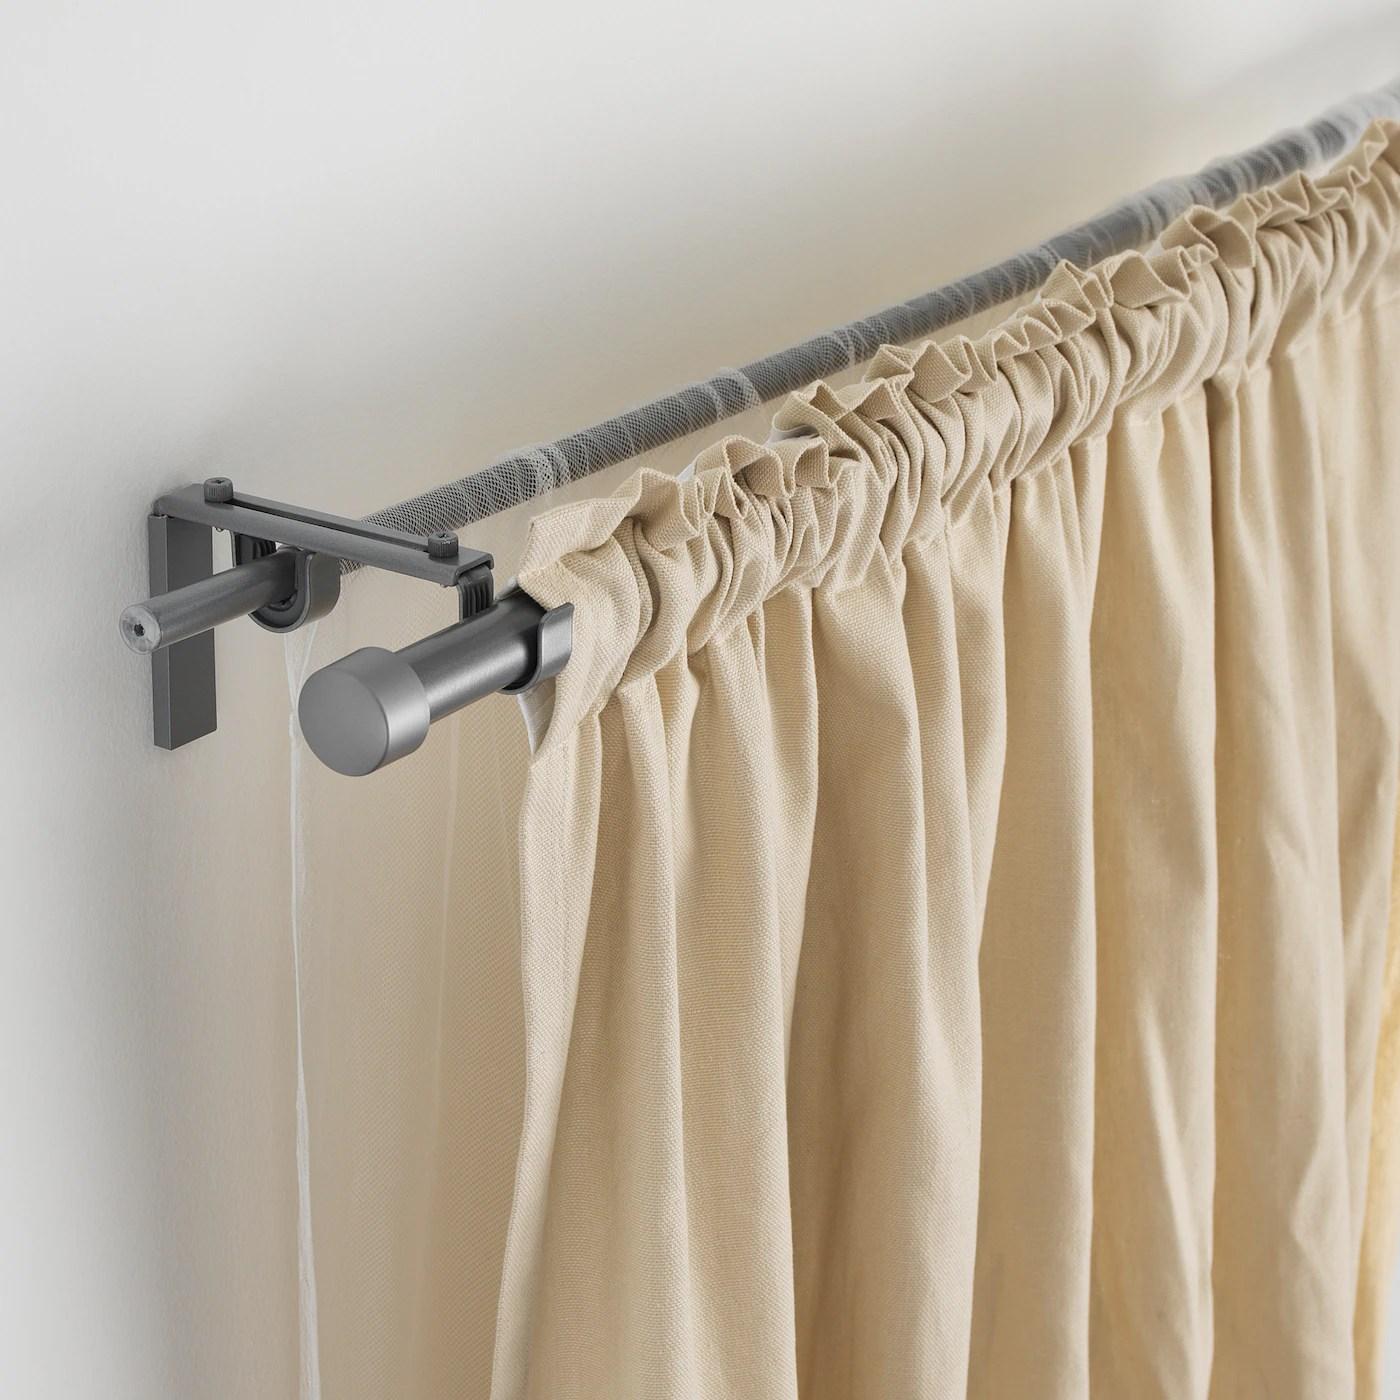 racka hugad double curtain rod combination silver colour 120 210 cm